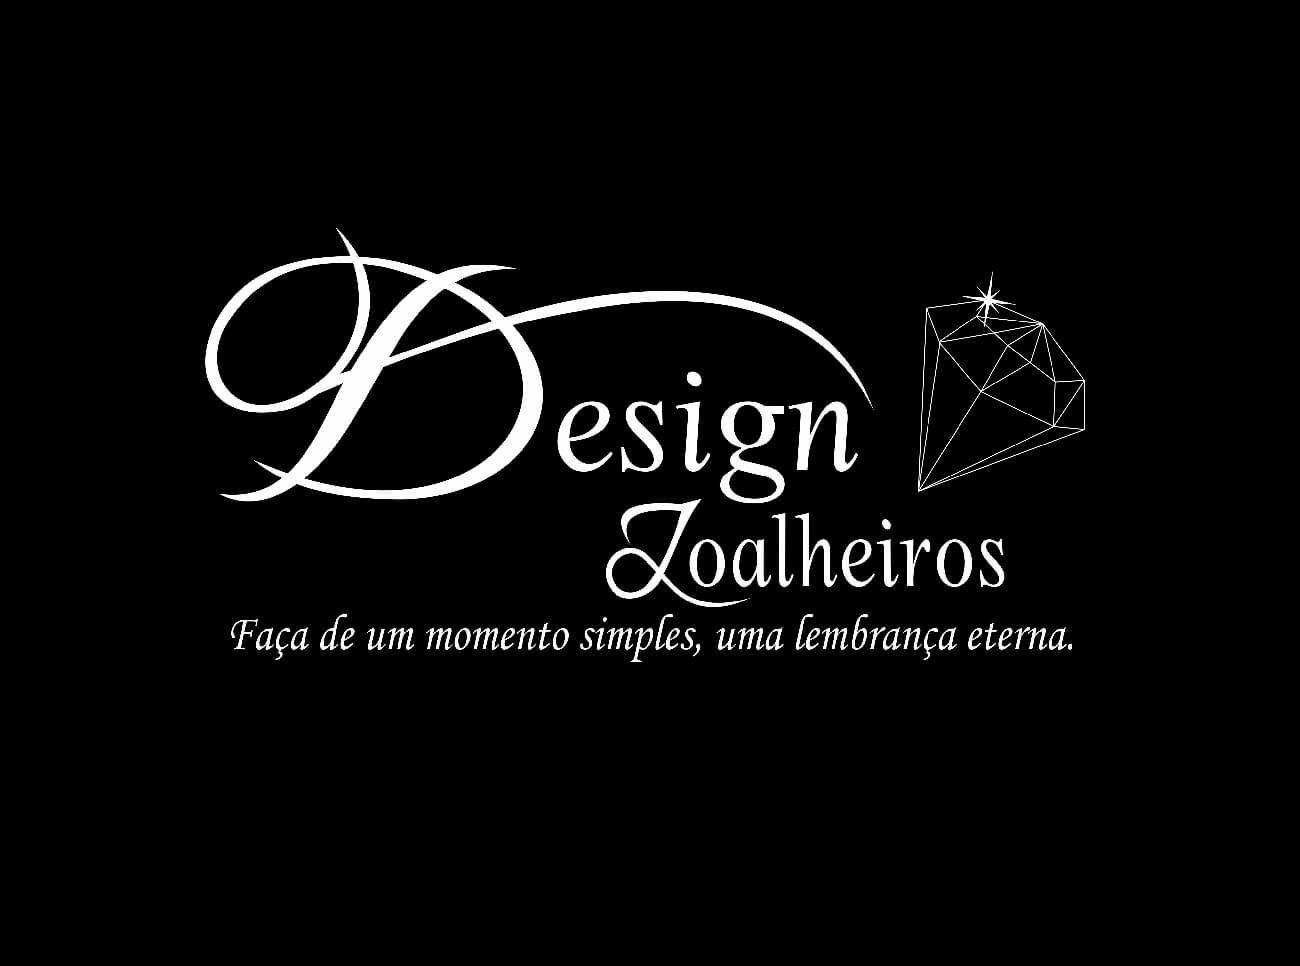 design-joalheiros